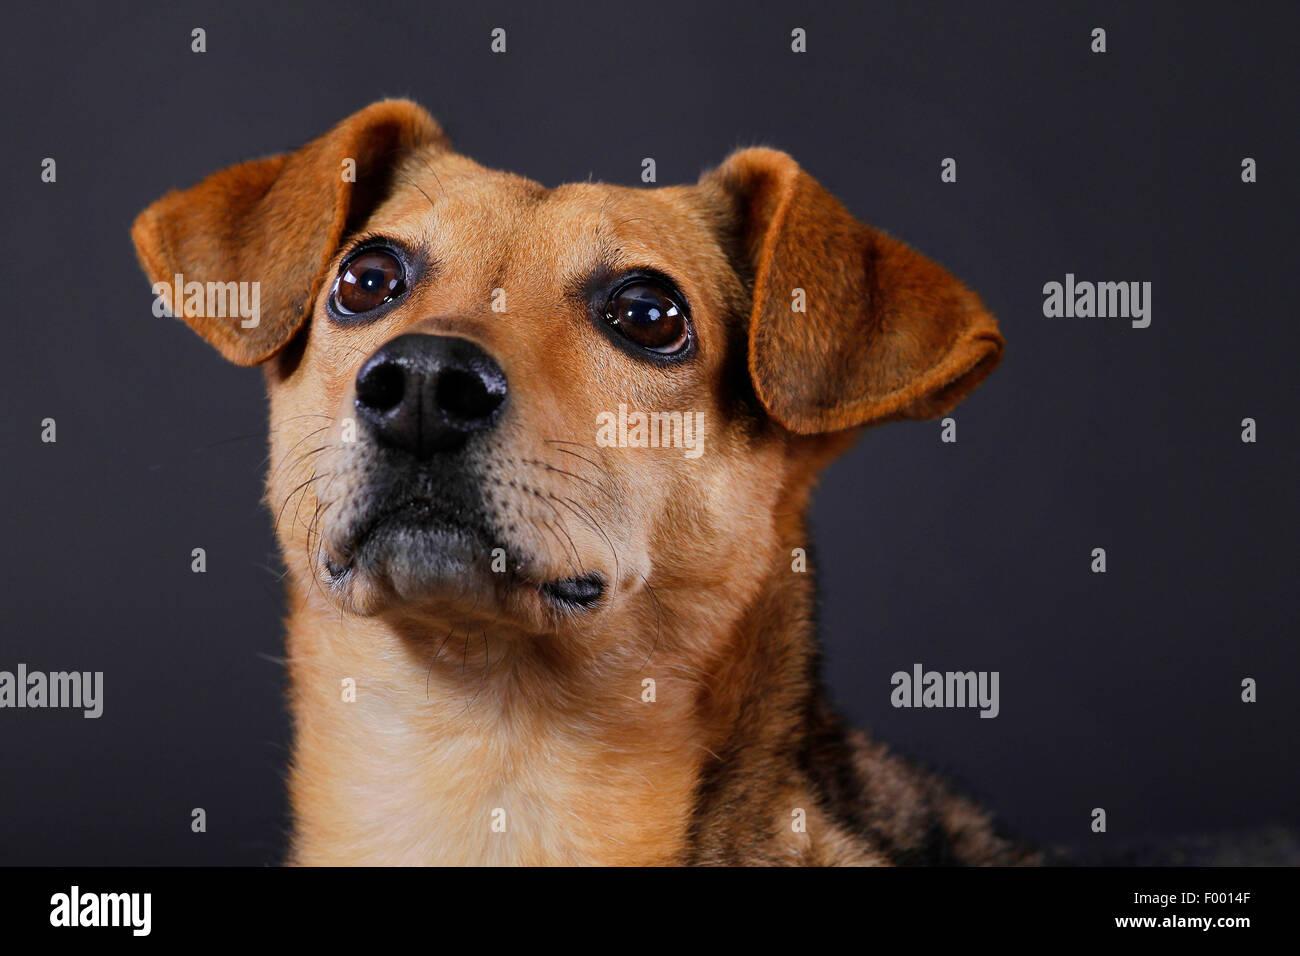 Perro doméstico (Canis lupus familiaris) f., retrato delante de fondo negro Imagen De Stock